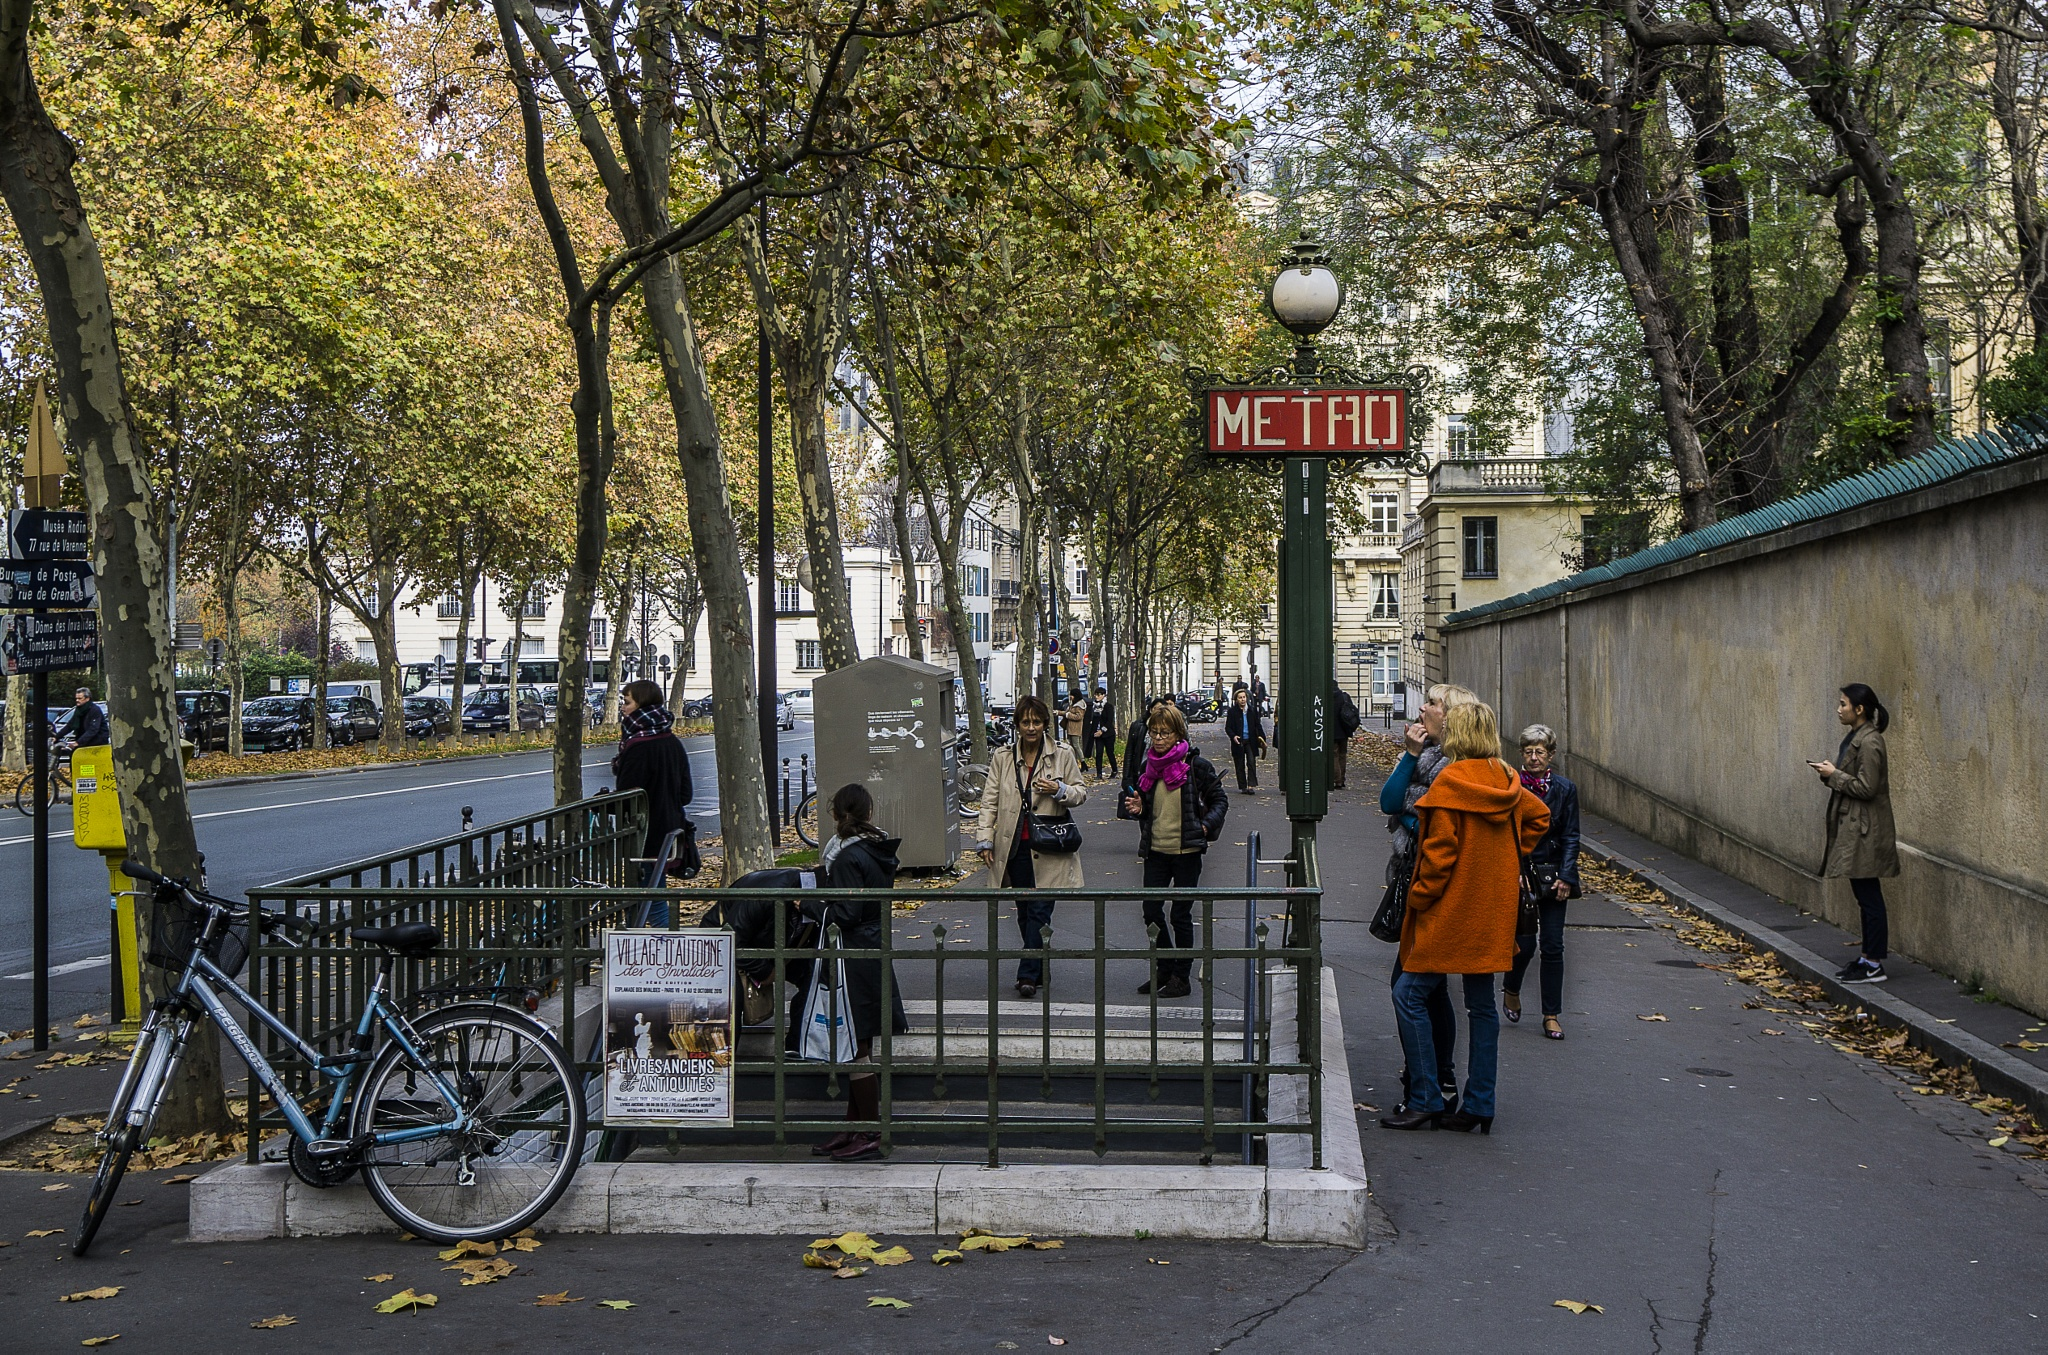 Metro Station entrance, Paris by Chris Lane